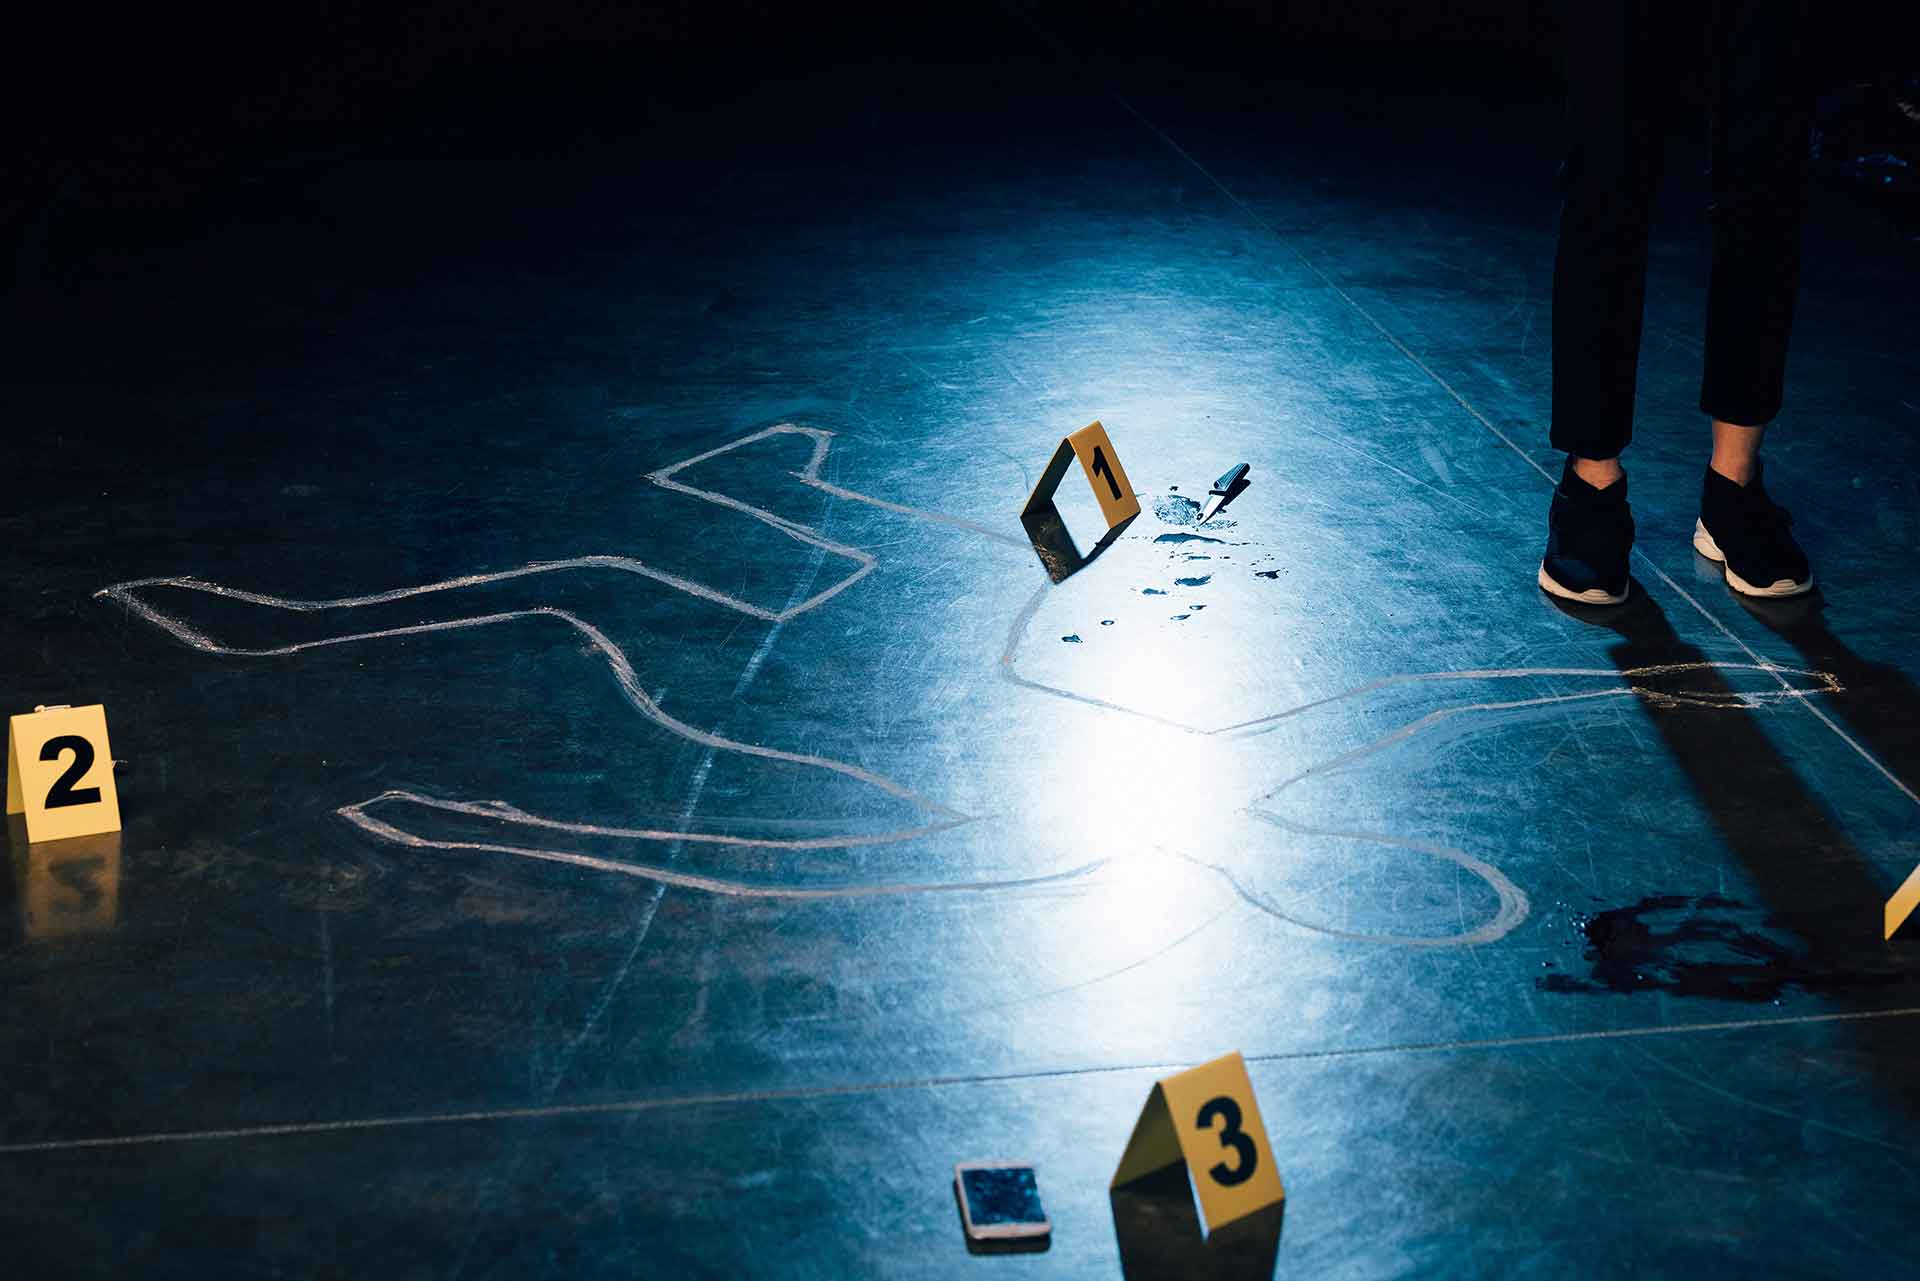 Schoolplein Moord Groningen - Spraakmakende strafzaken